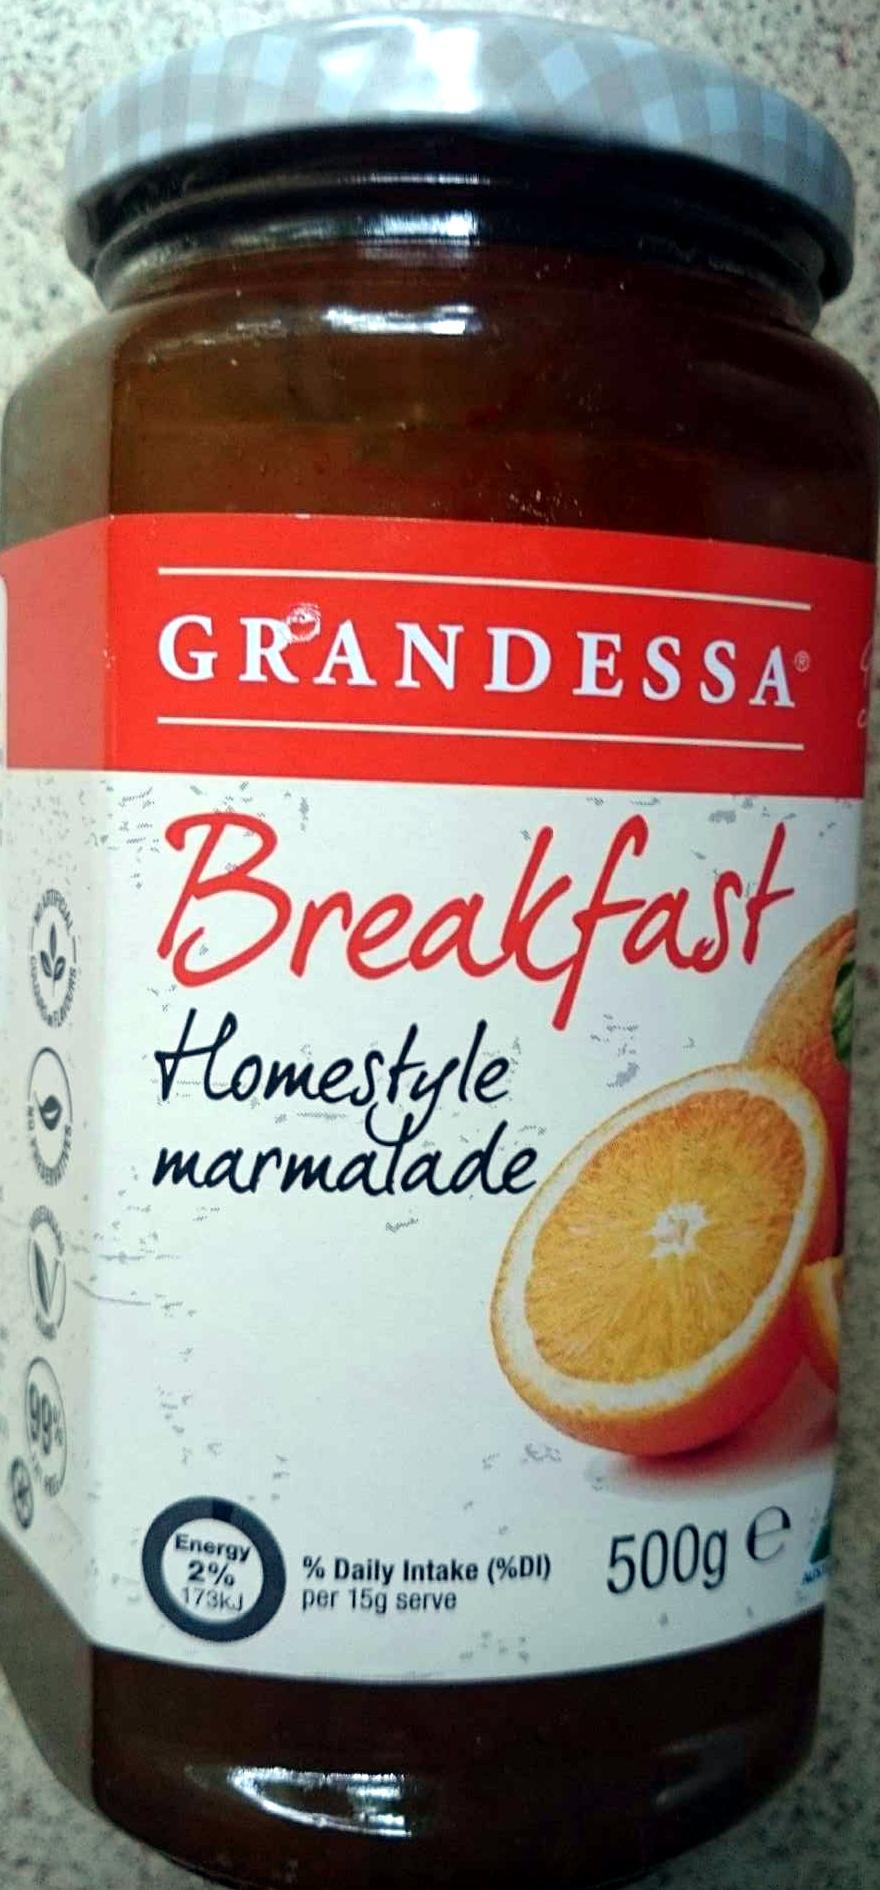 Homestyle Breakfast Marmalade - Product - en